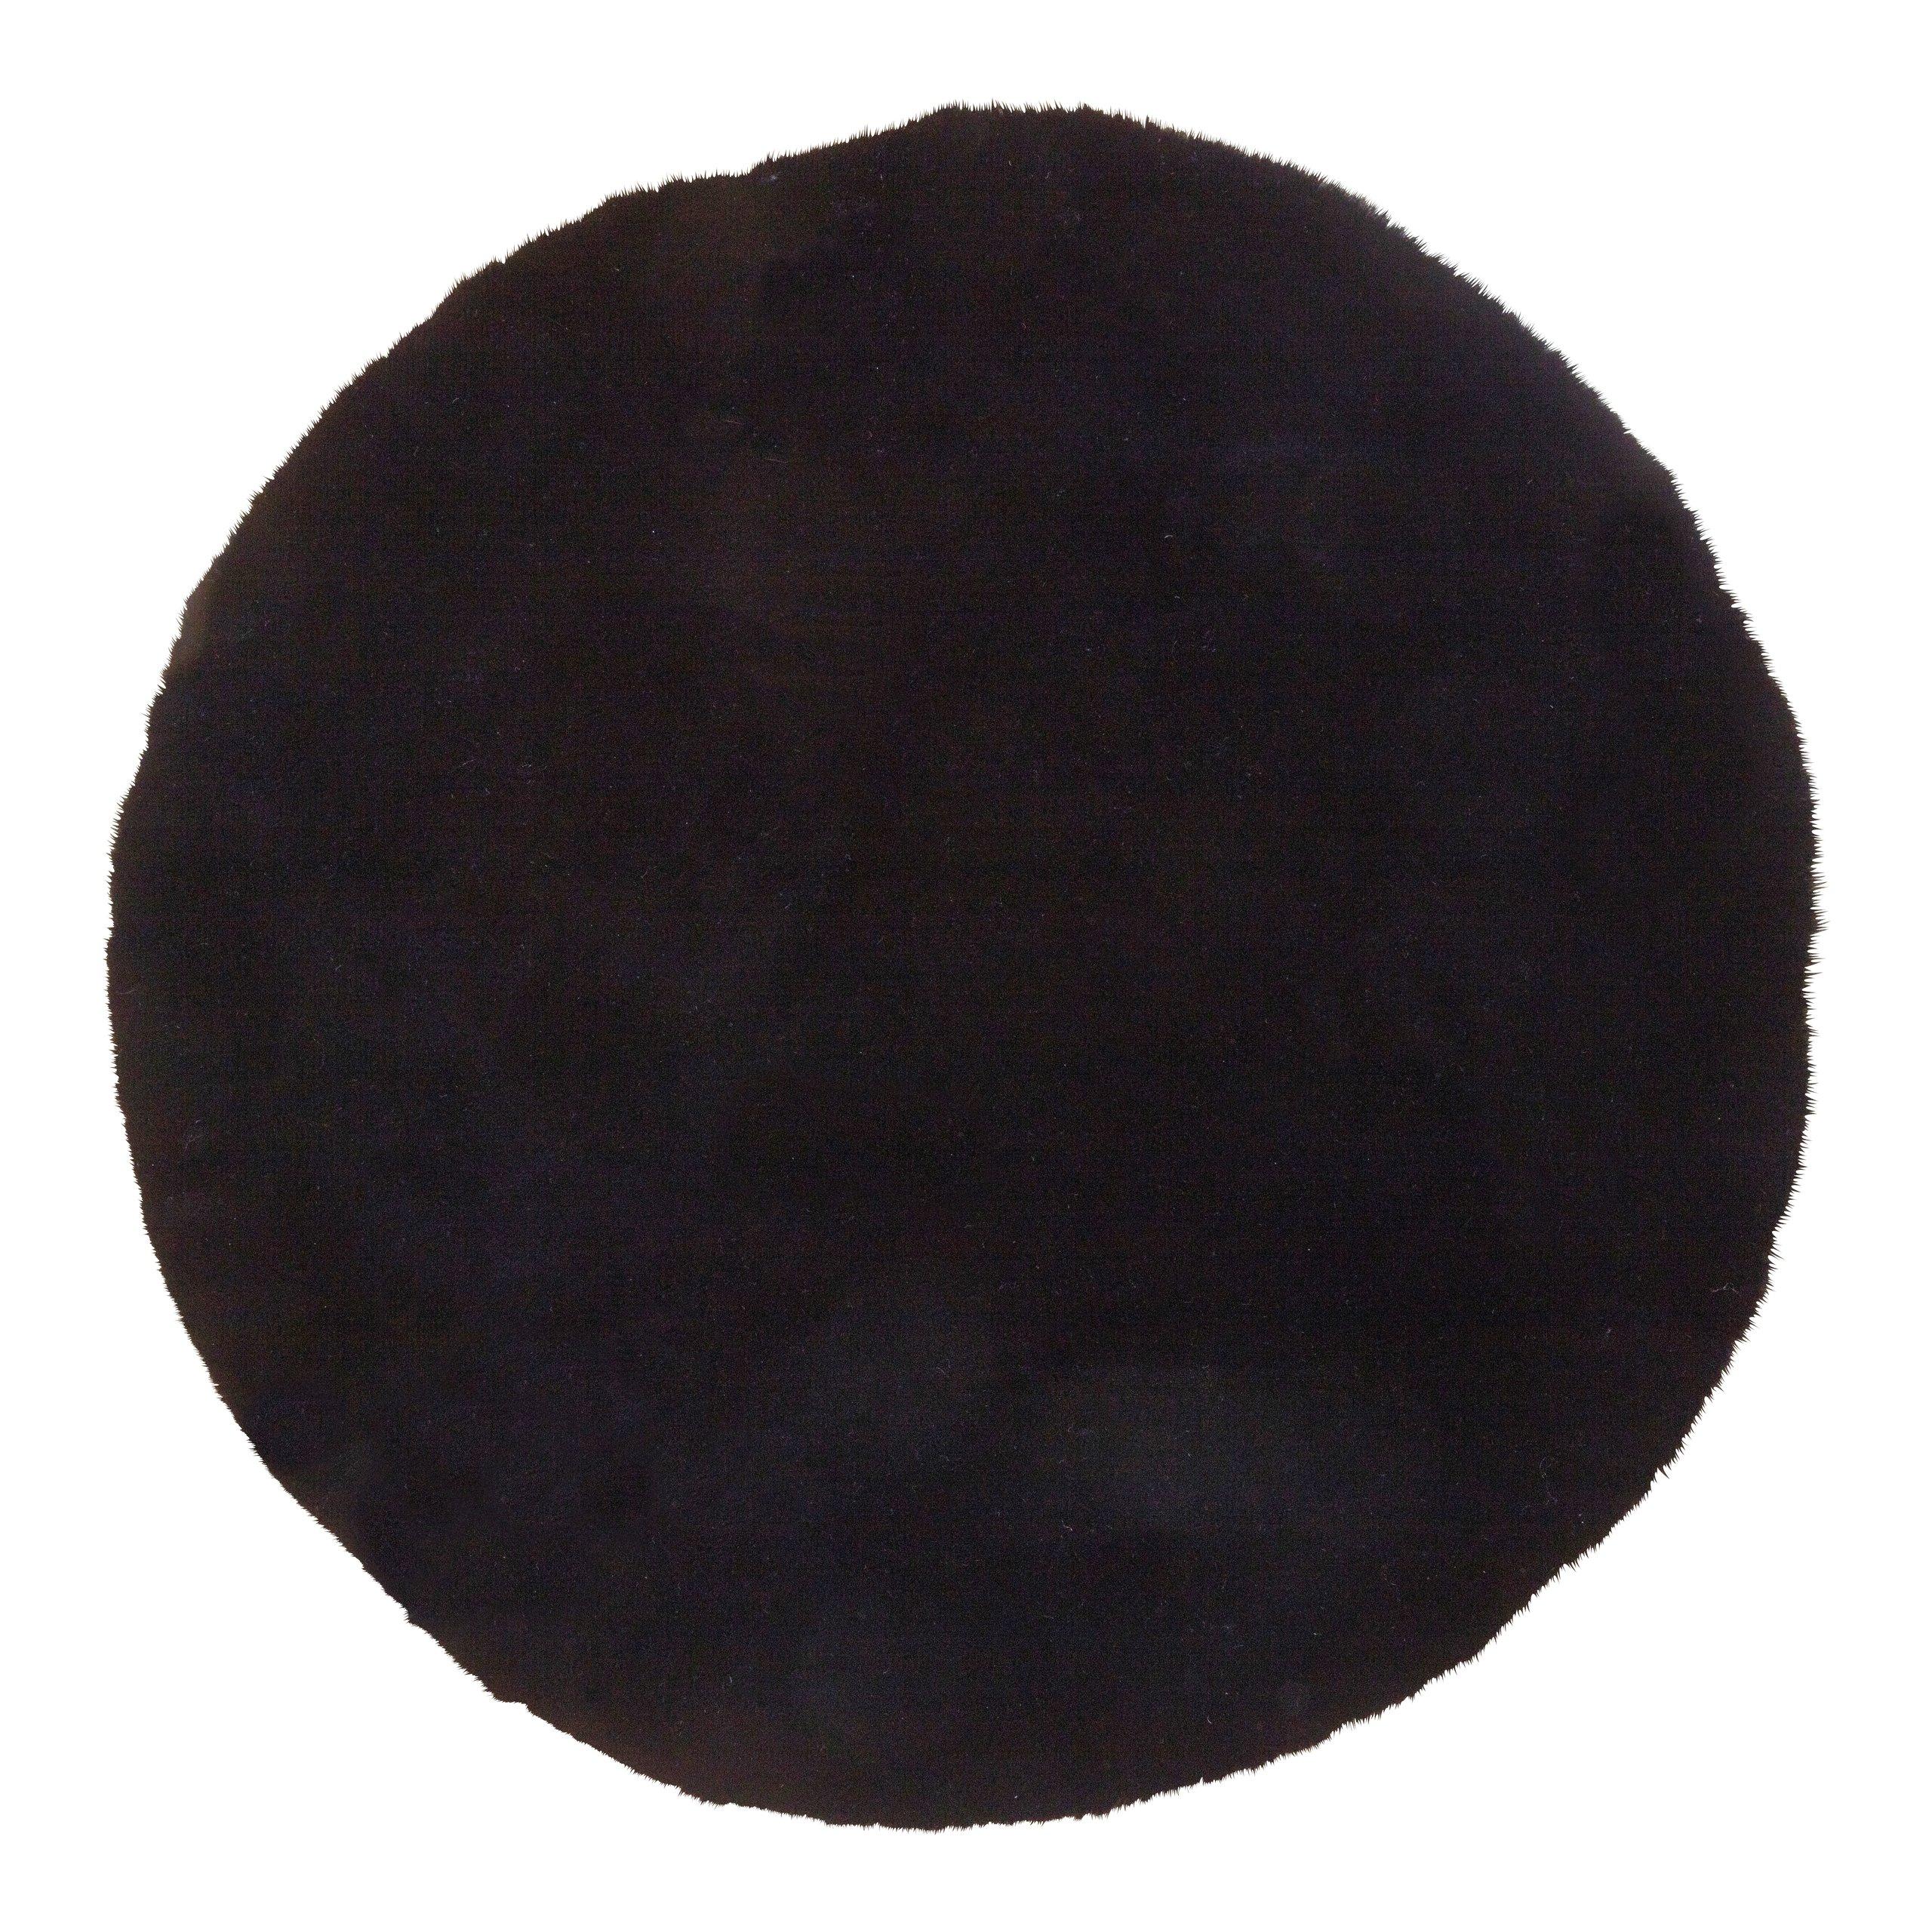 BLACK BEAUTY TEPPE Ø80CM SORT-101562